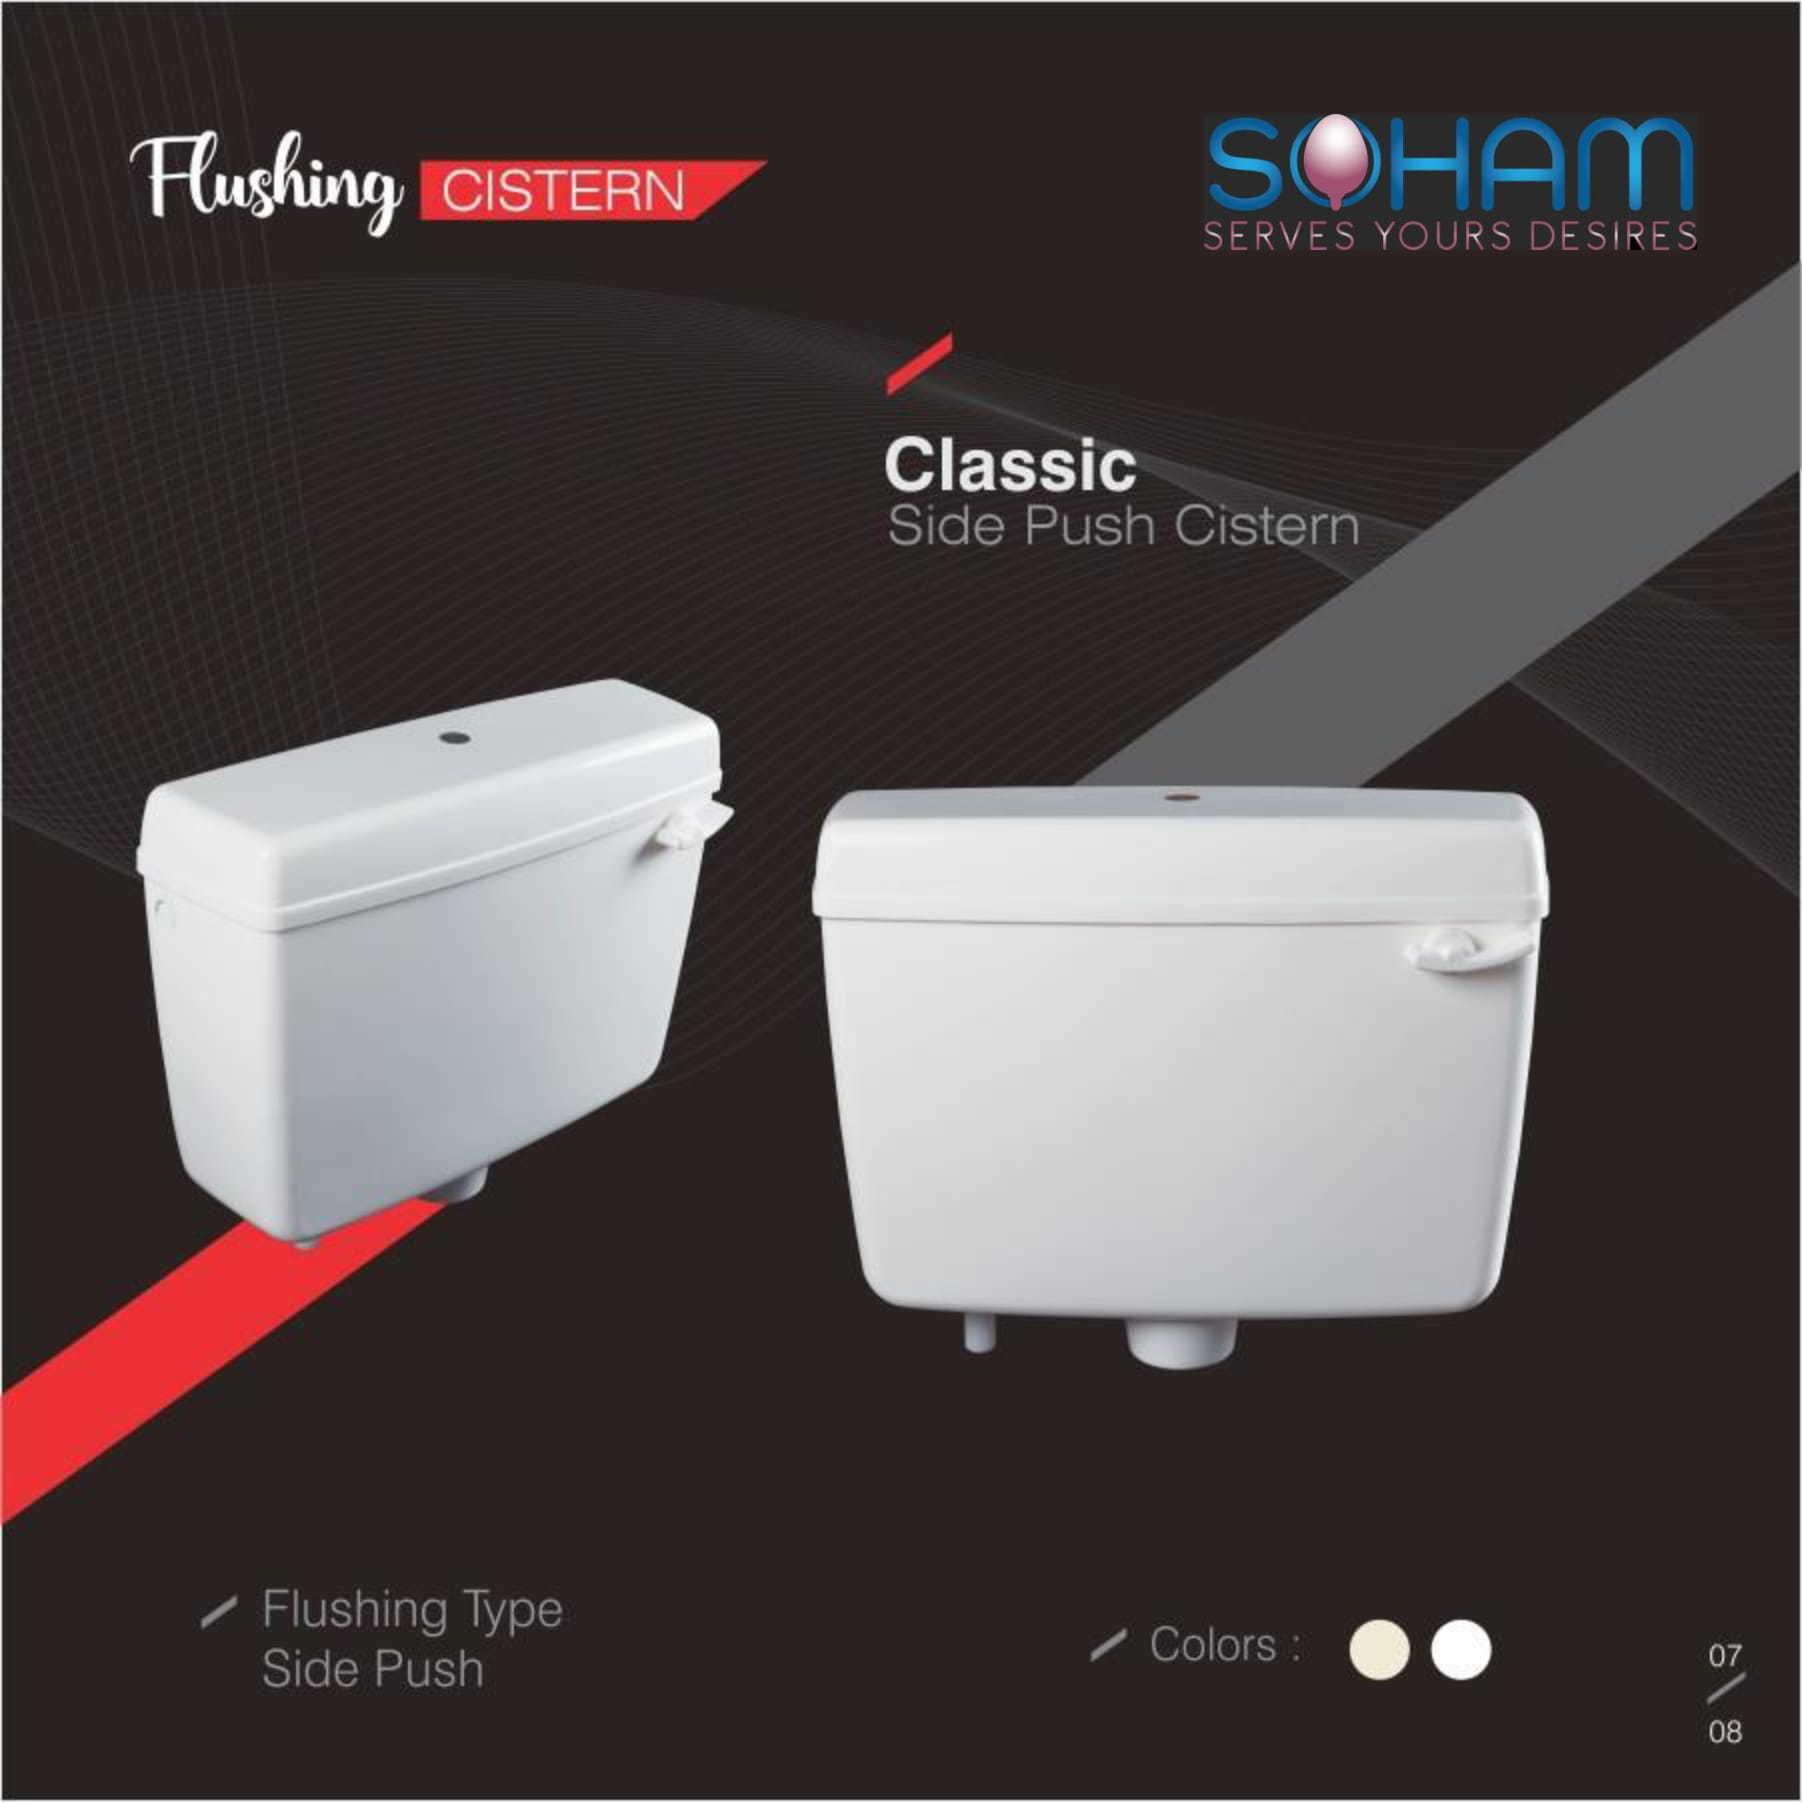 Classic Single Flush Cistern